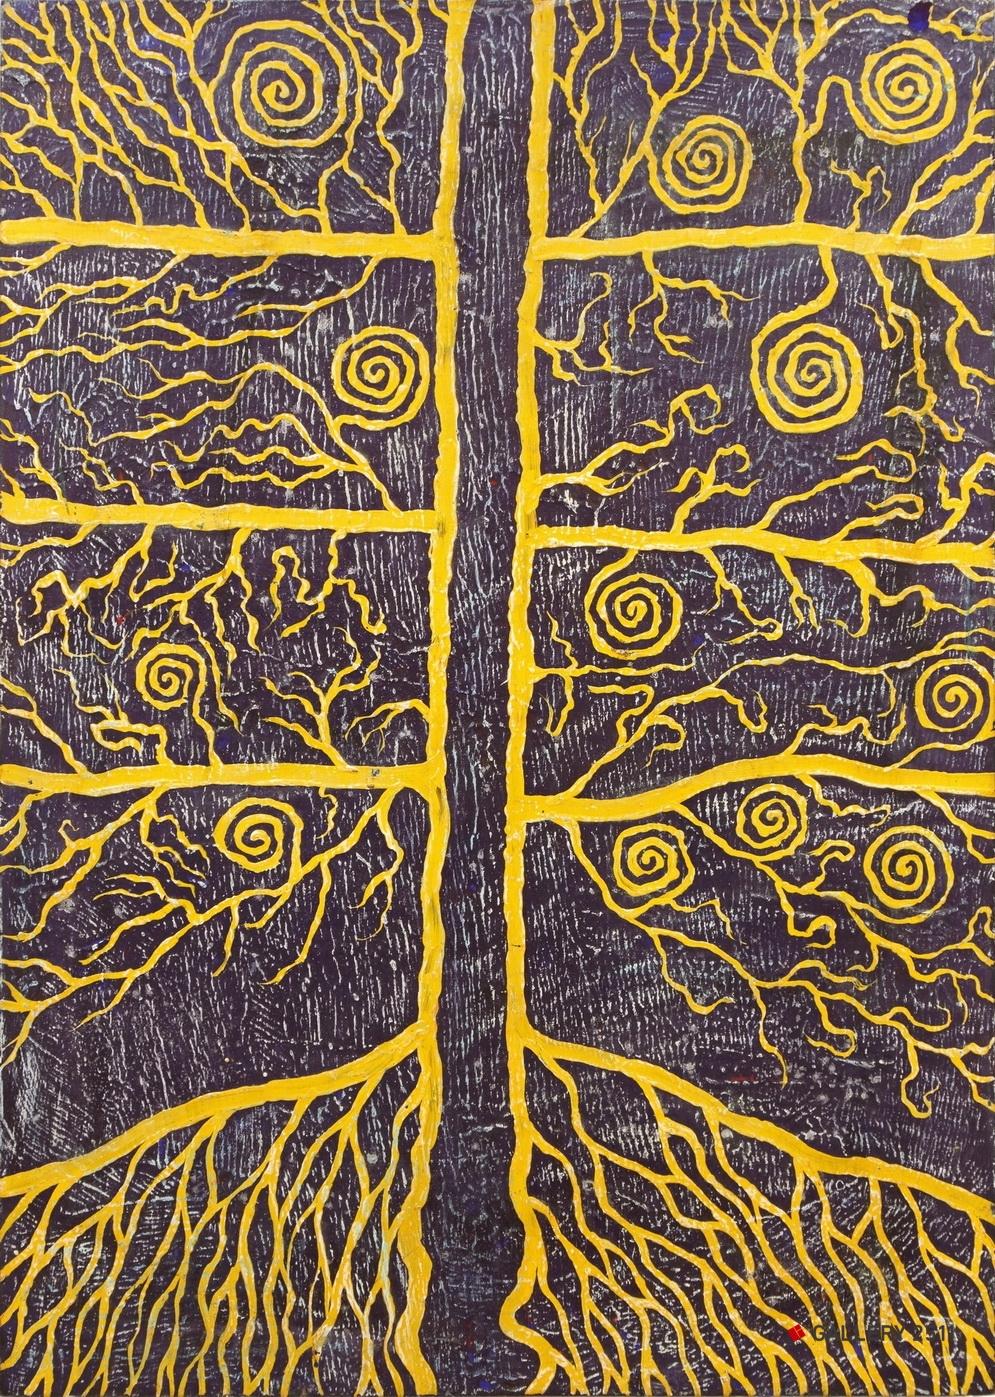 No.002 -「生命の樹 #007」  Acrilic on Wood panel, W420mm× H595mm, 1998.07.04